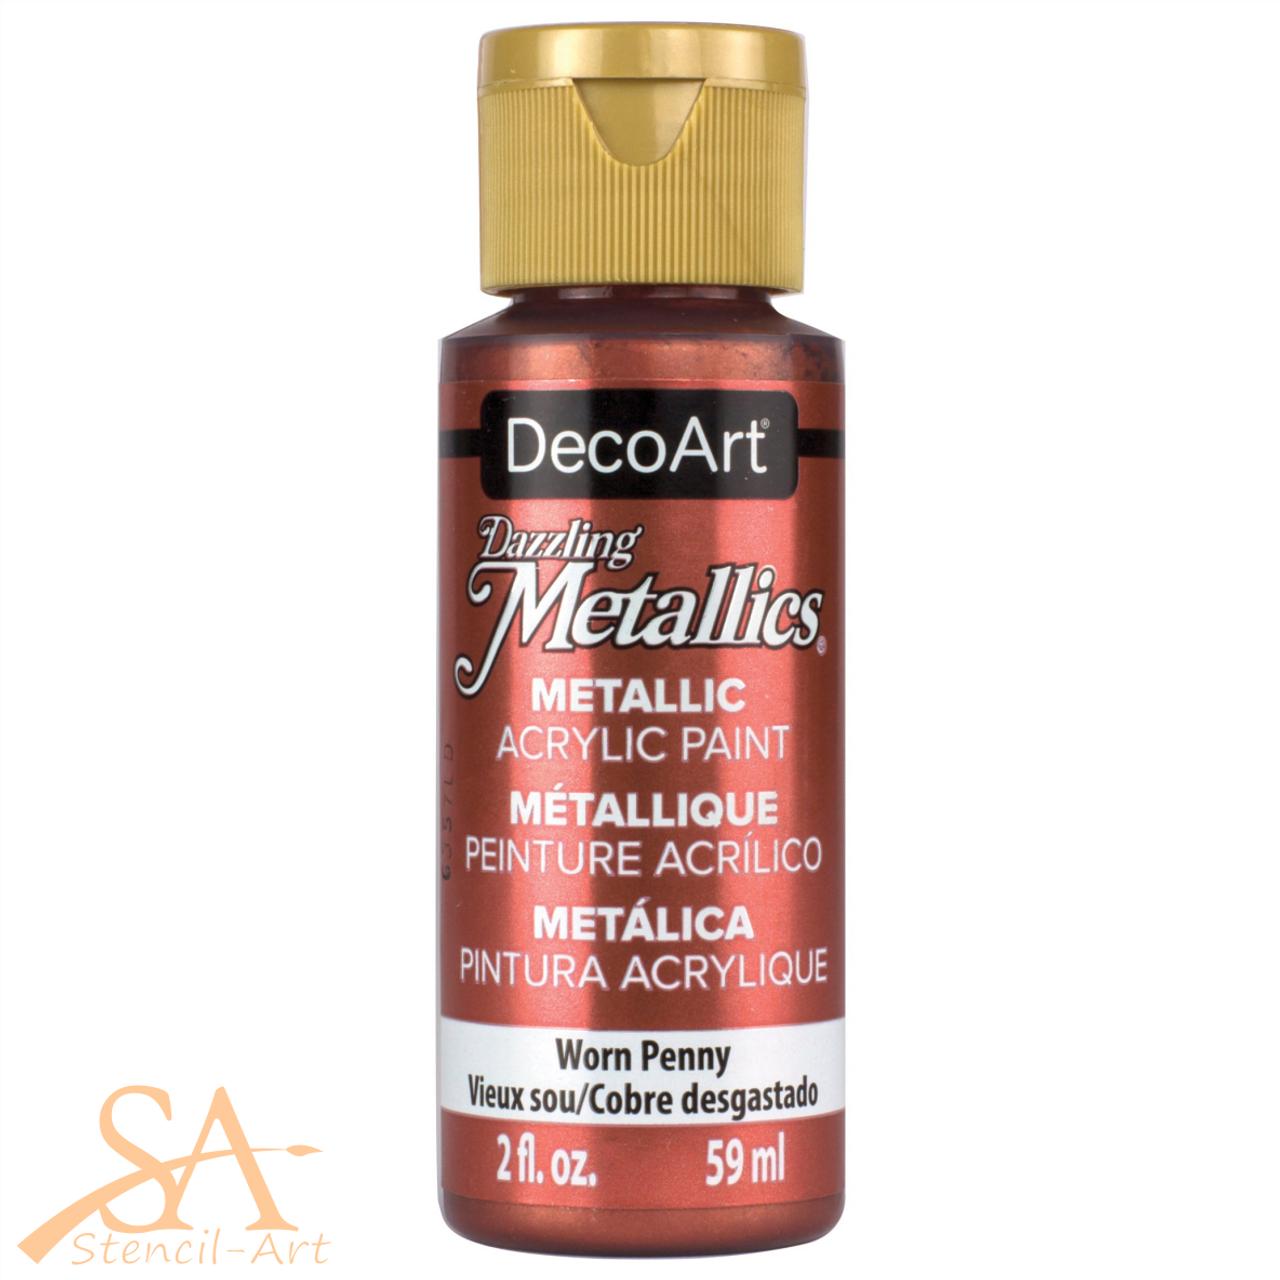 DecoArt Dazzling Metallics Acrylic Paint 59ml - Worn Penny